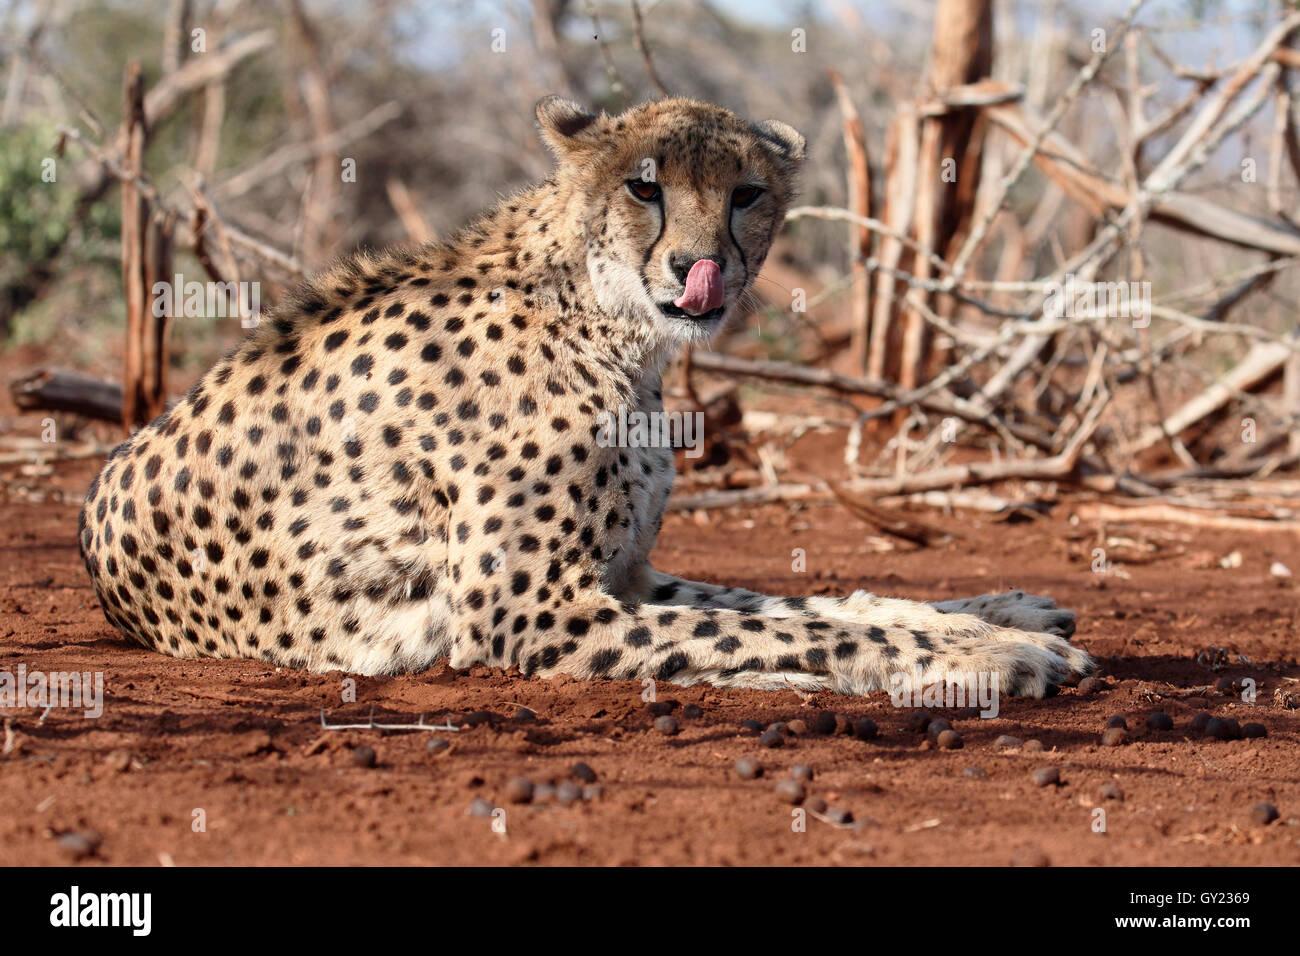 Cheetah, Acinonyx jubatus, singolo cat, Sud Africa, Agosto 2016 Immagini Stock